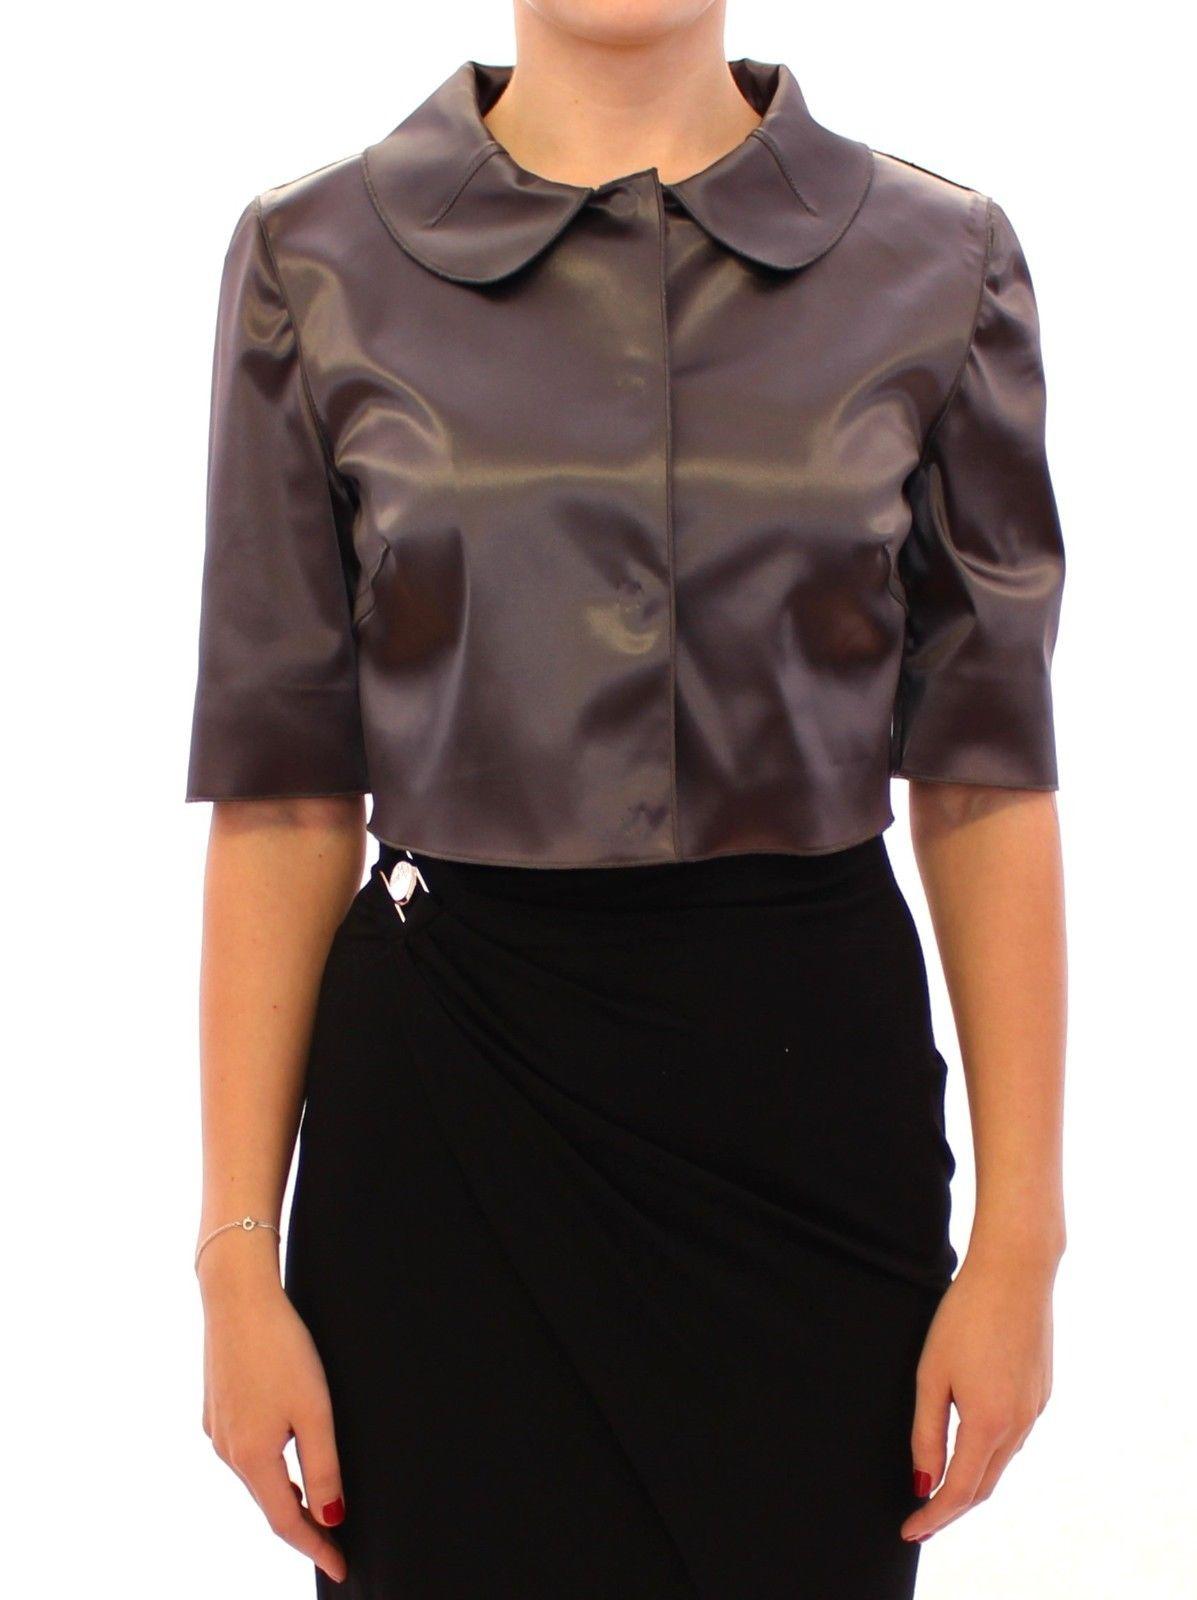 Dolce & Gabbana Women's Shiny Stretch Bolero Shrug Jacket Gray GSS11367 - IT38 XS